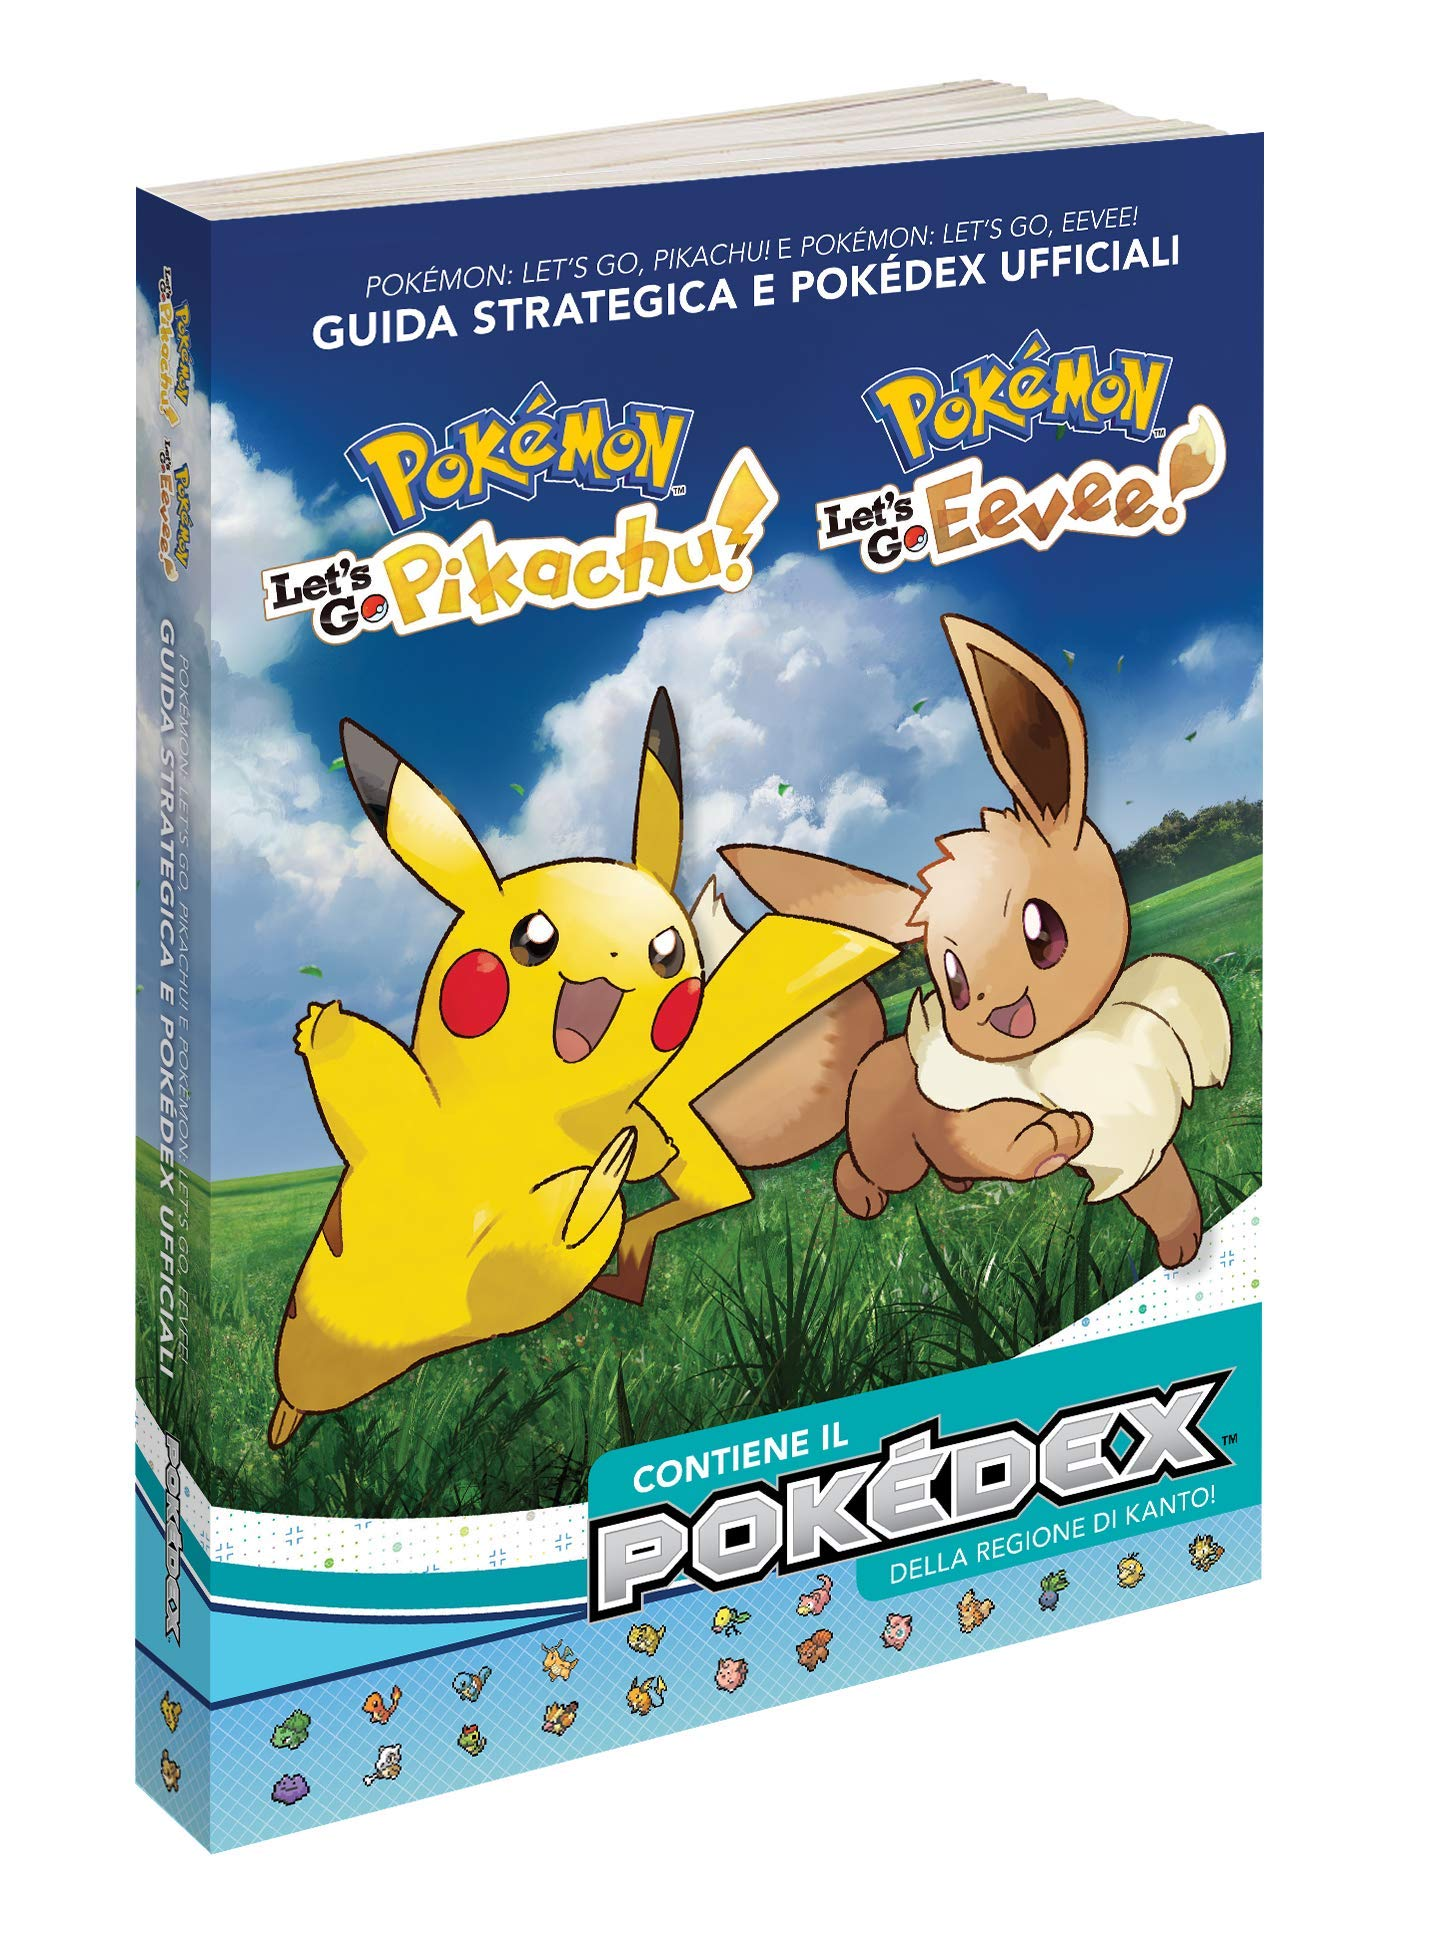 Pokémon: Lets go, Pikachu! E Pokémon: lets go, Eevee! Guida ...